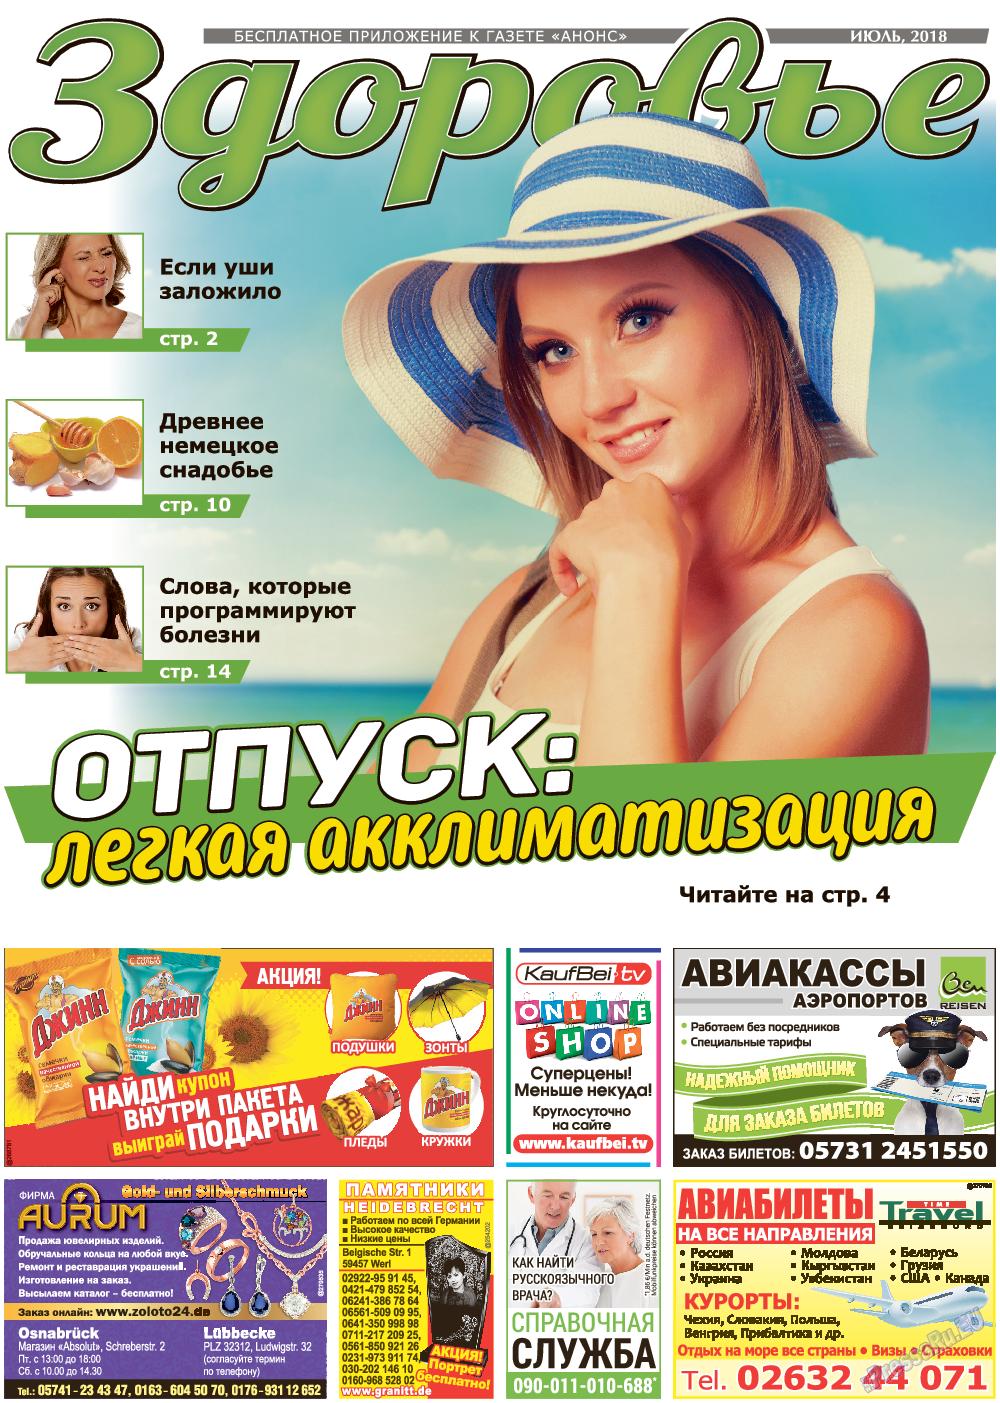 Здоровье (газета). 2018 год, номер 7, стр. 1